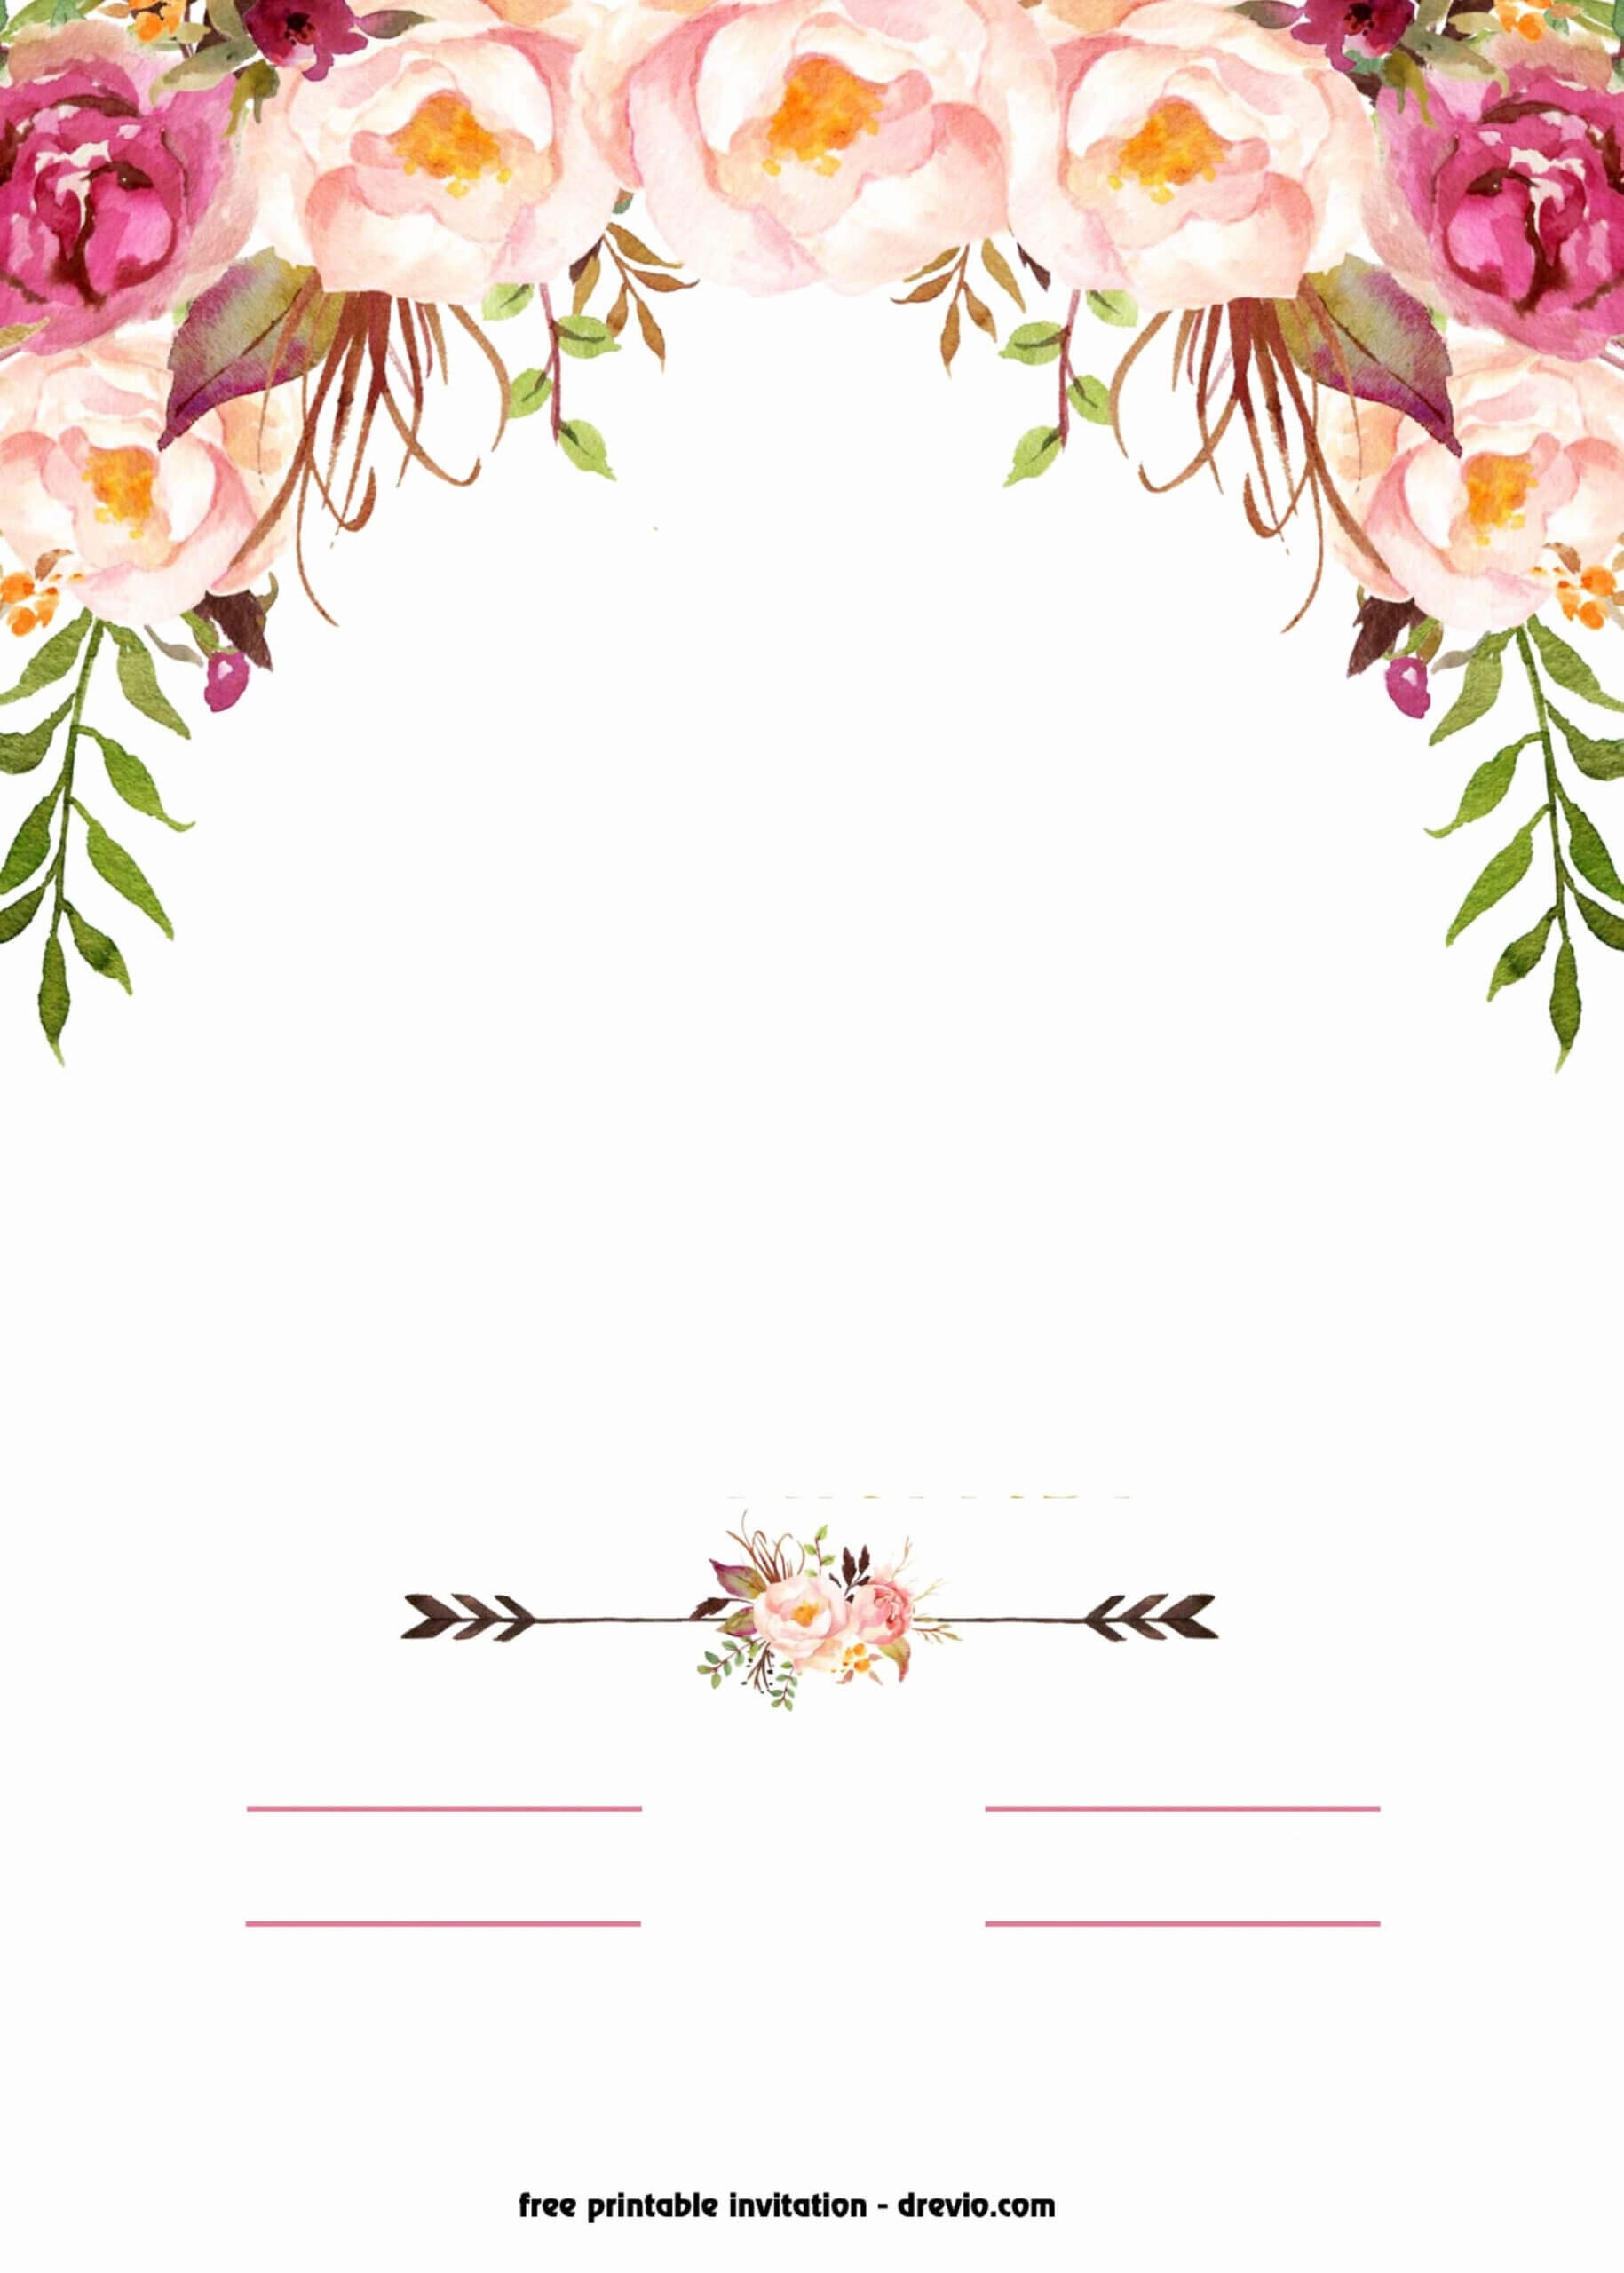 Fantastic Free Blank Invitation Templates Template Ideas Within Blank Templates For Invitations